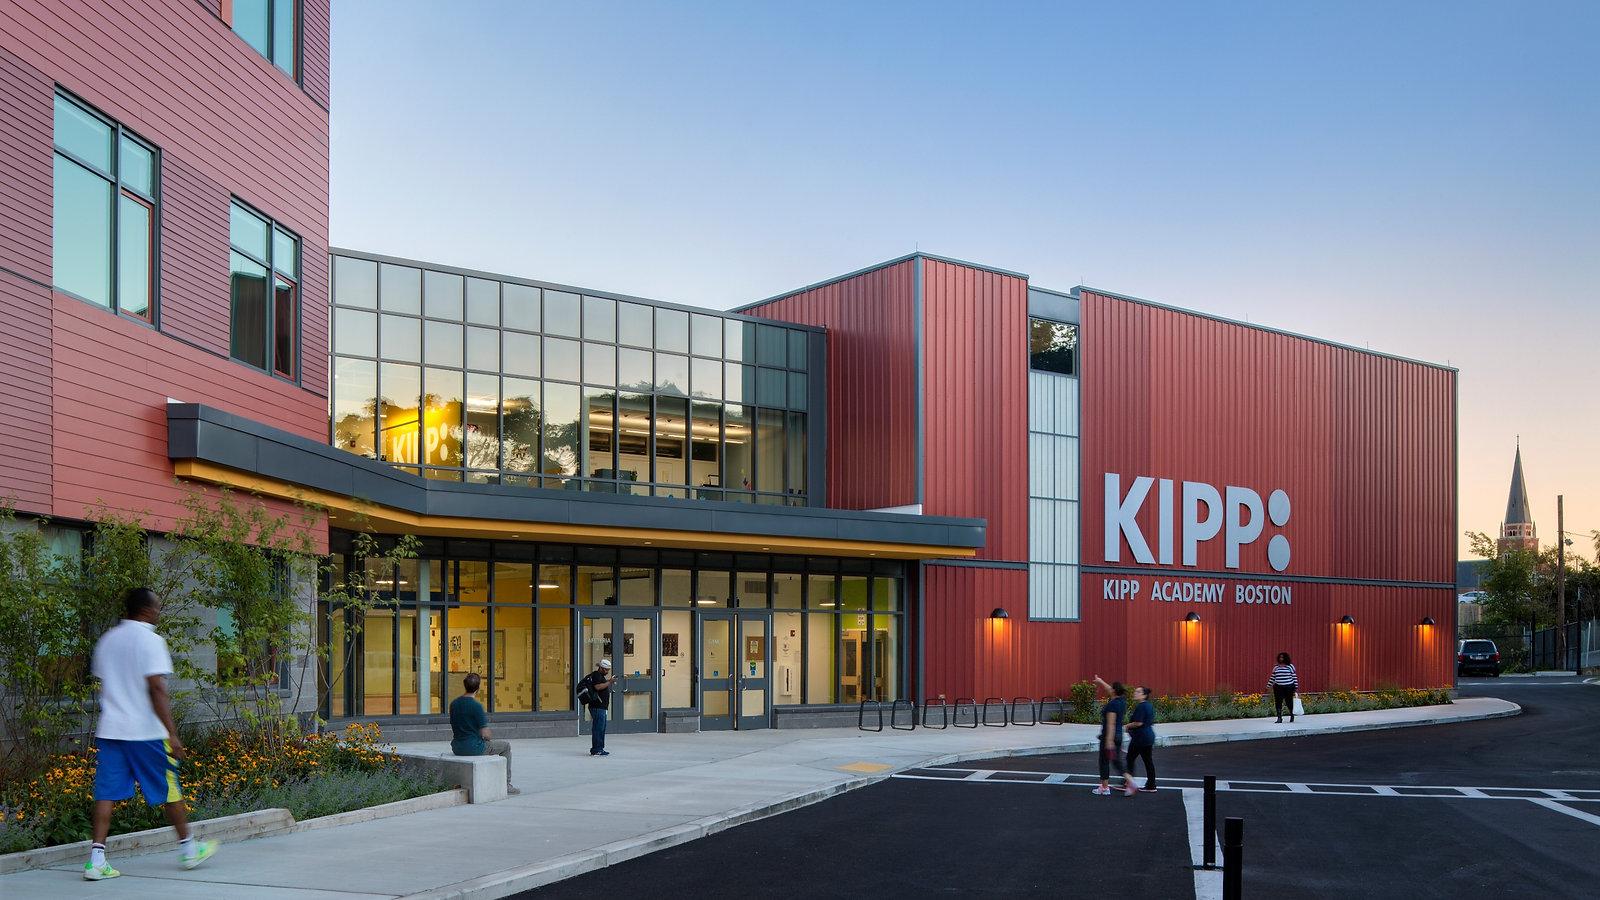 KIPP-15_edited_edited.jpg